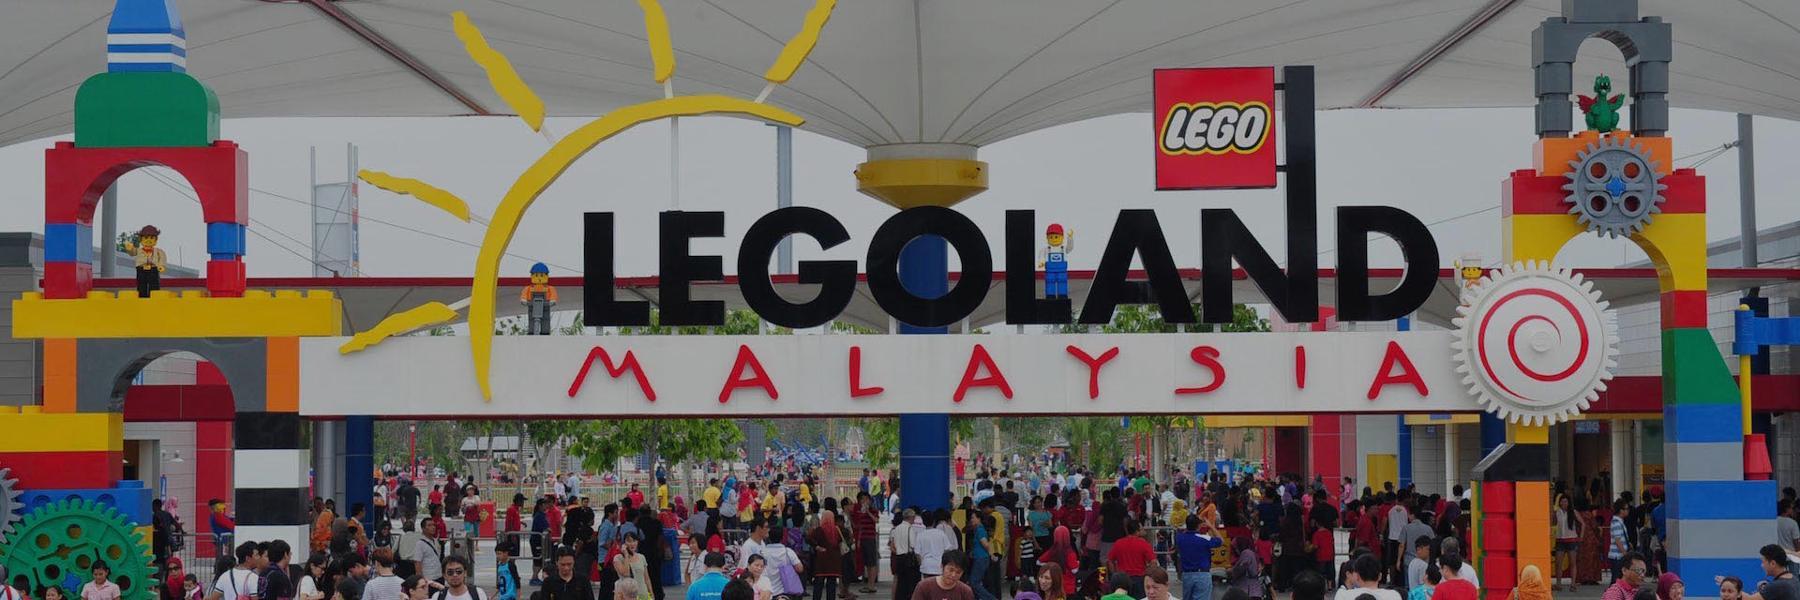 LEGOLAND Malaysia   Buy Tickets   Hapz